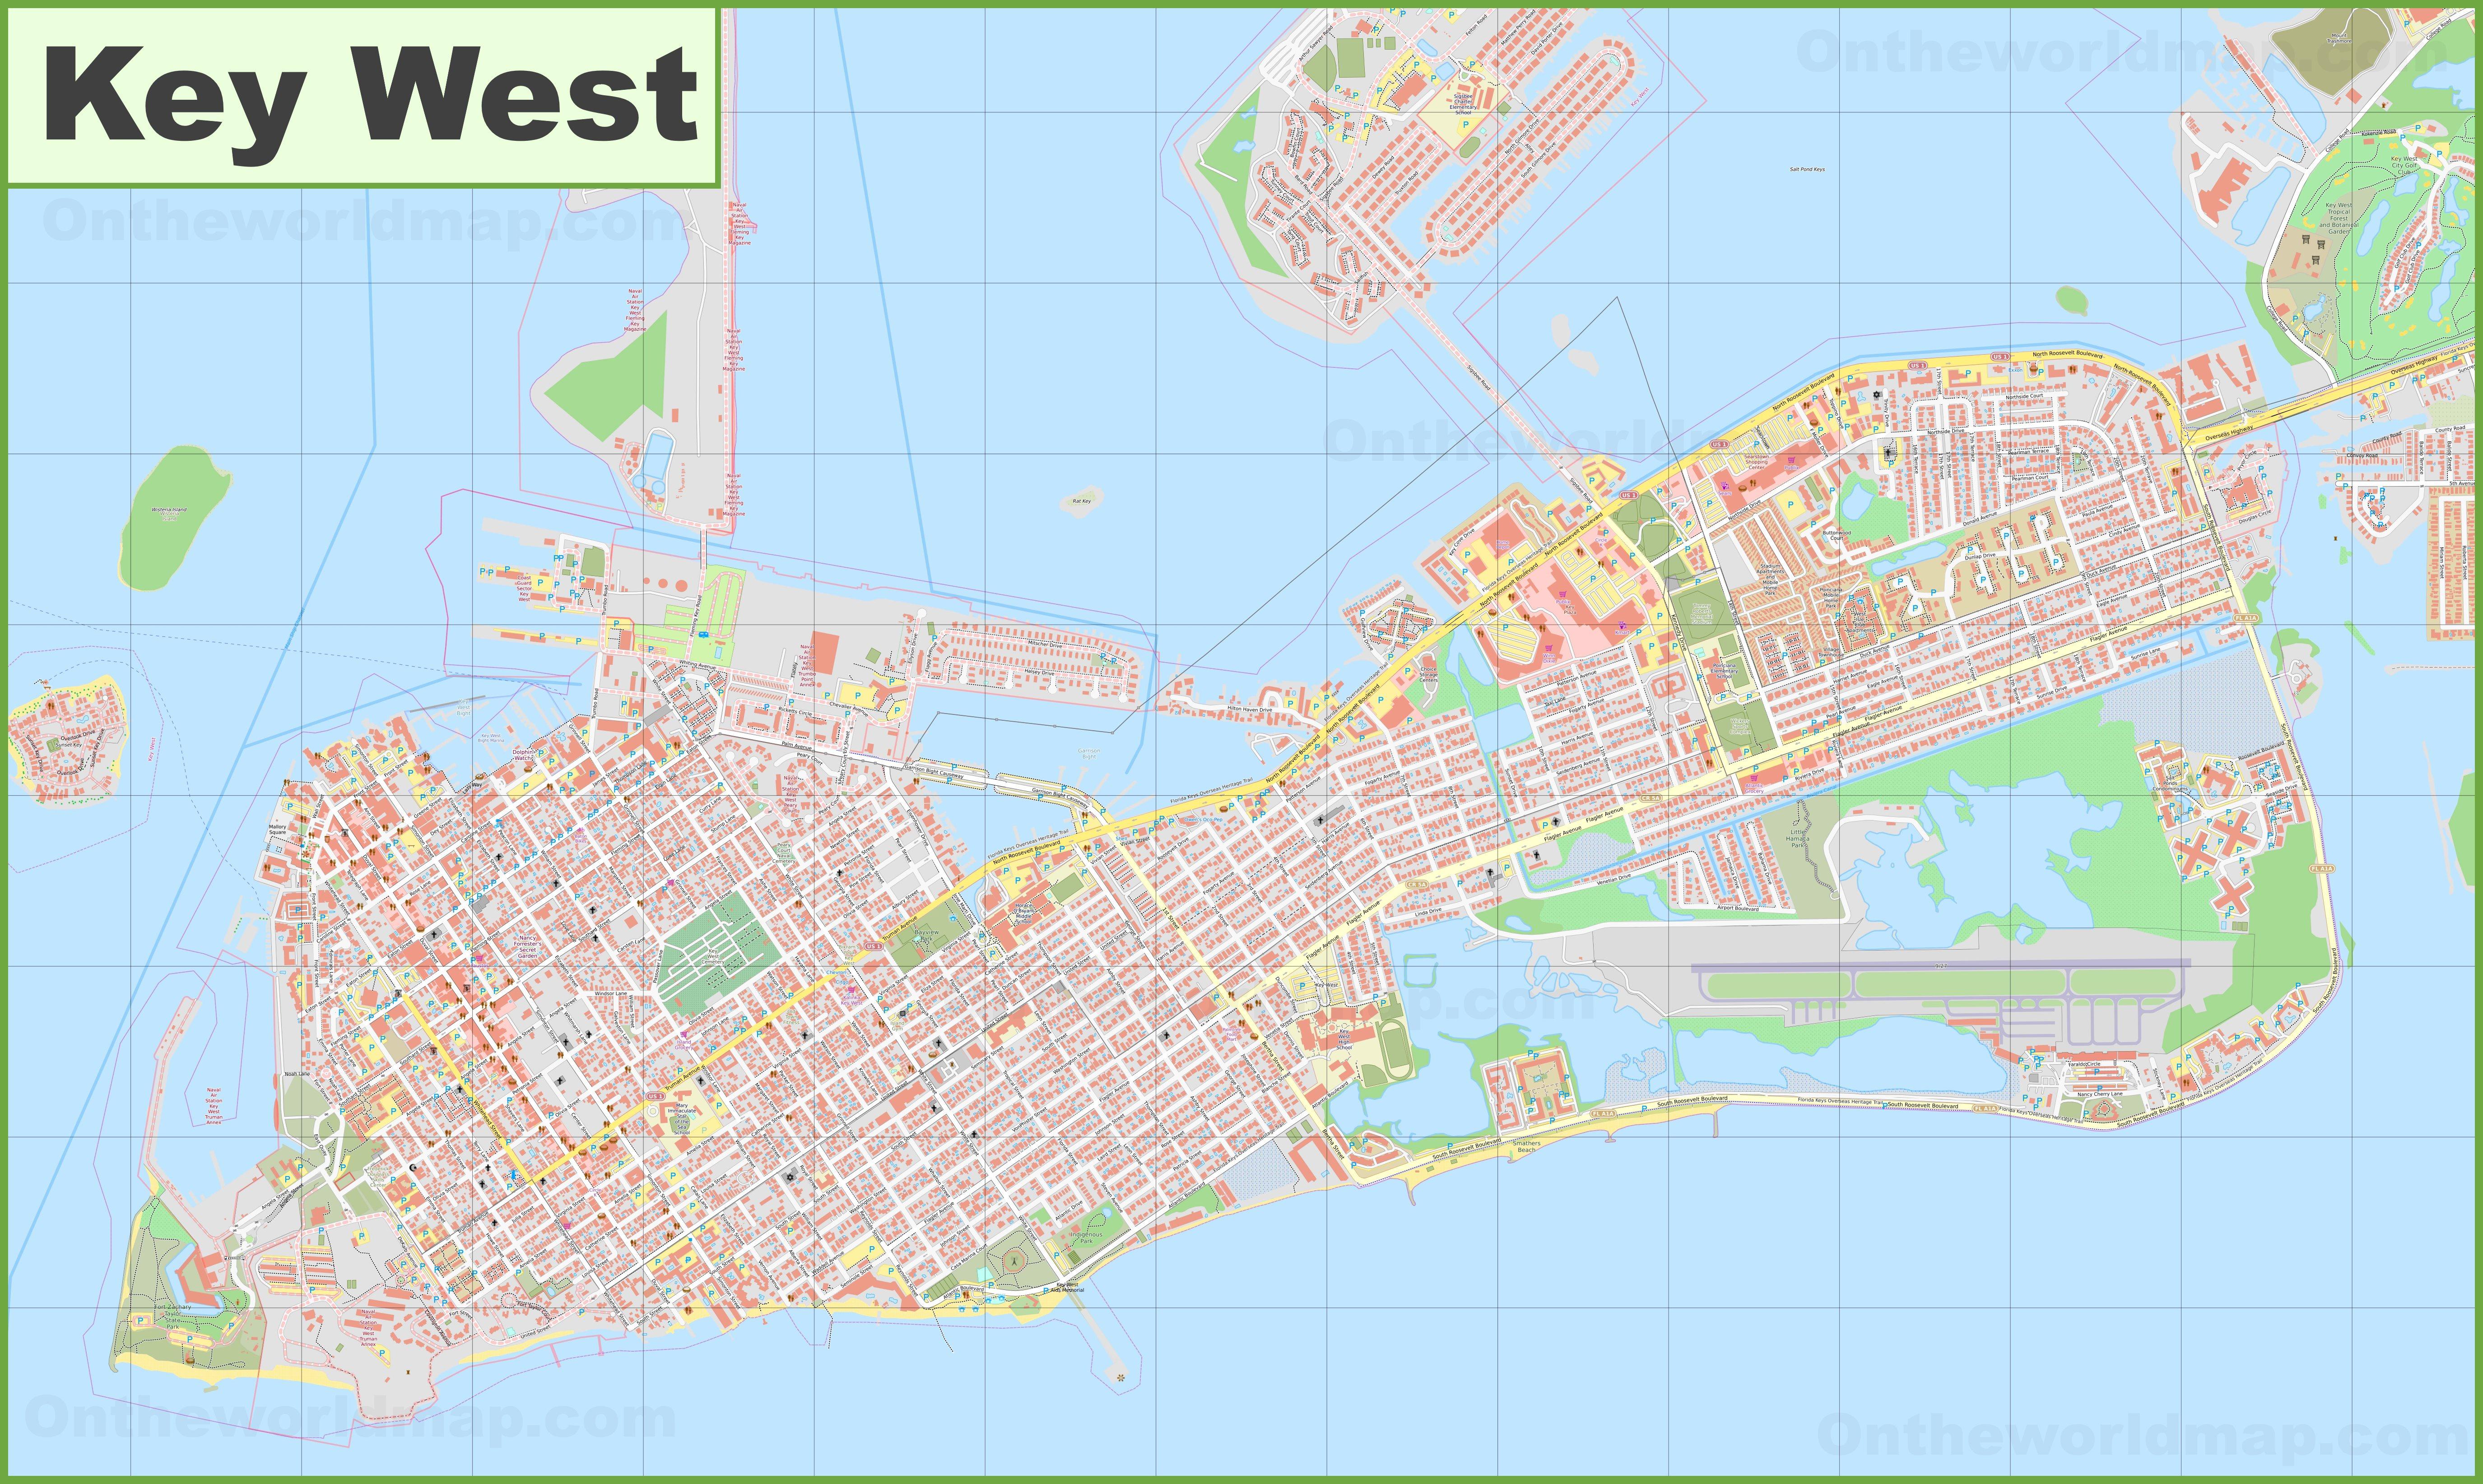 Large detailed map of Key West on orlando map, tampa map, florida map, monroe county map, broward county map, california map, chicago map, cape kennedy map, siesta key map, hawaii map, grand cayman map, new york city map, palm beach county map, marathon keys map, texas map, big coppitt key map, freeport bahamas map, fl keys map, boston map, georgia map,